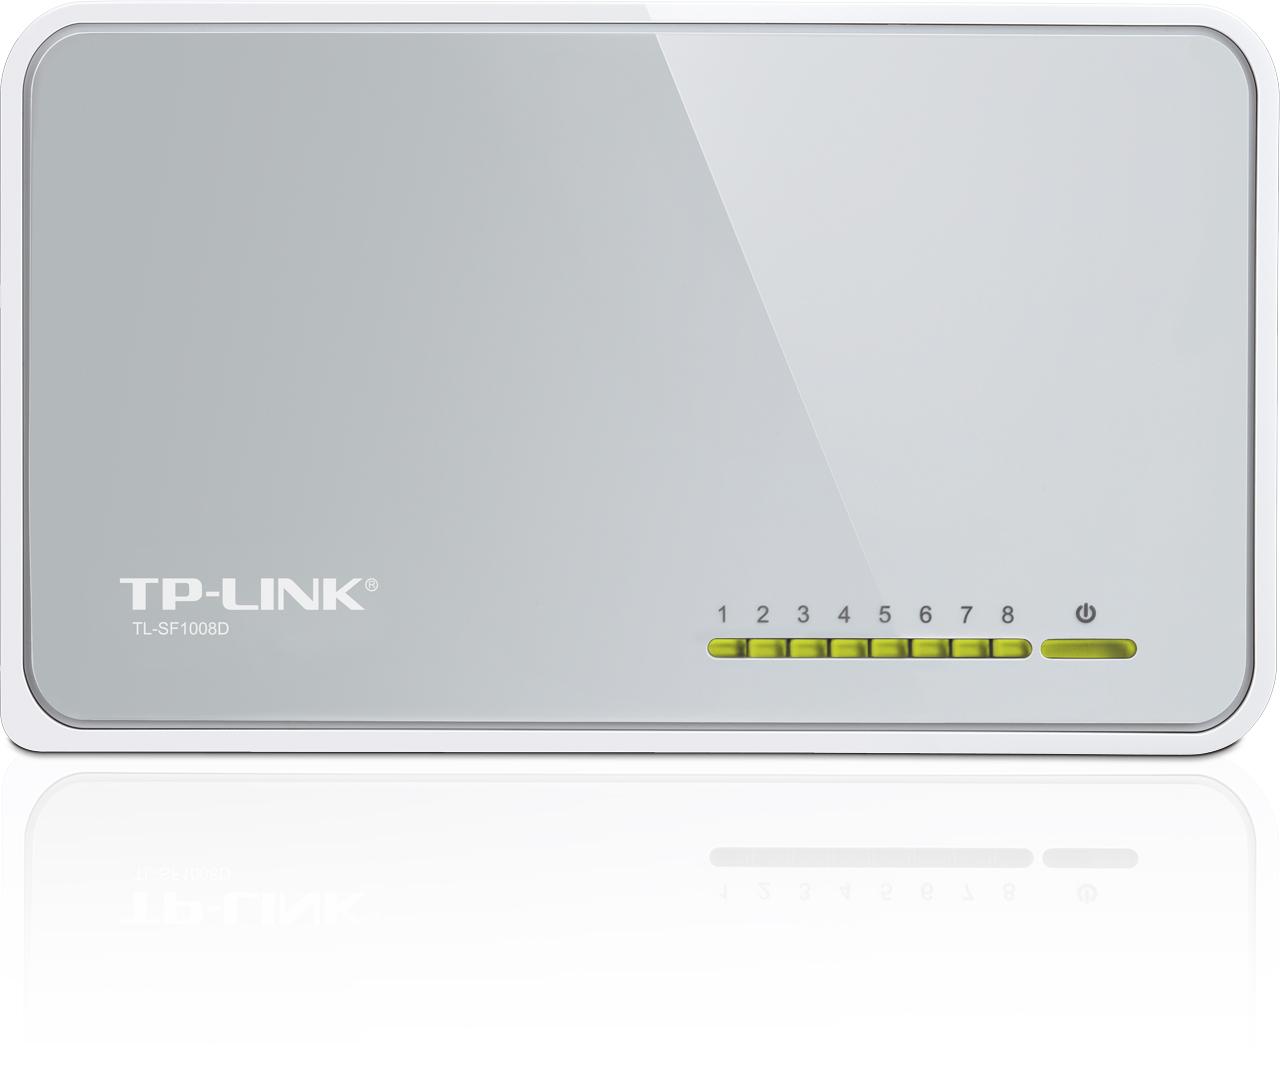 TP-Link TL-SF1008D 8x 10/100Mbps Desktop Switch